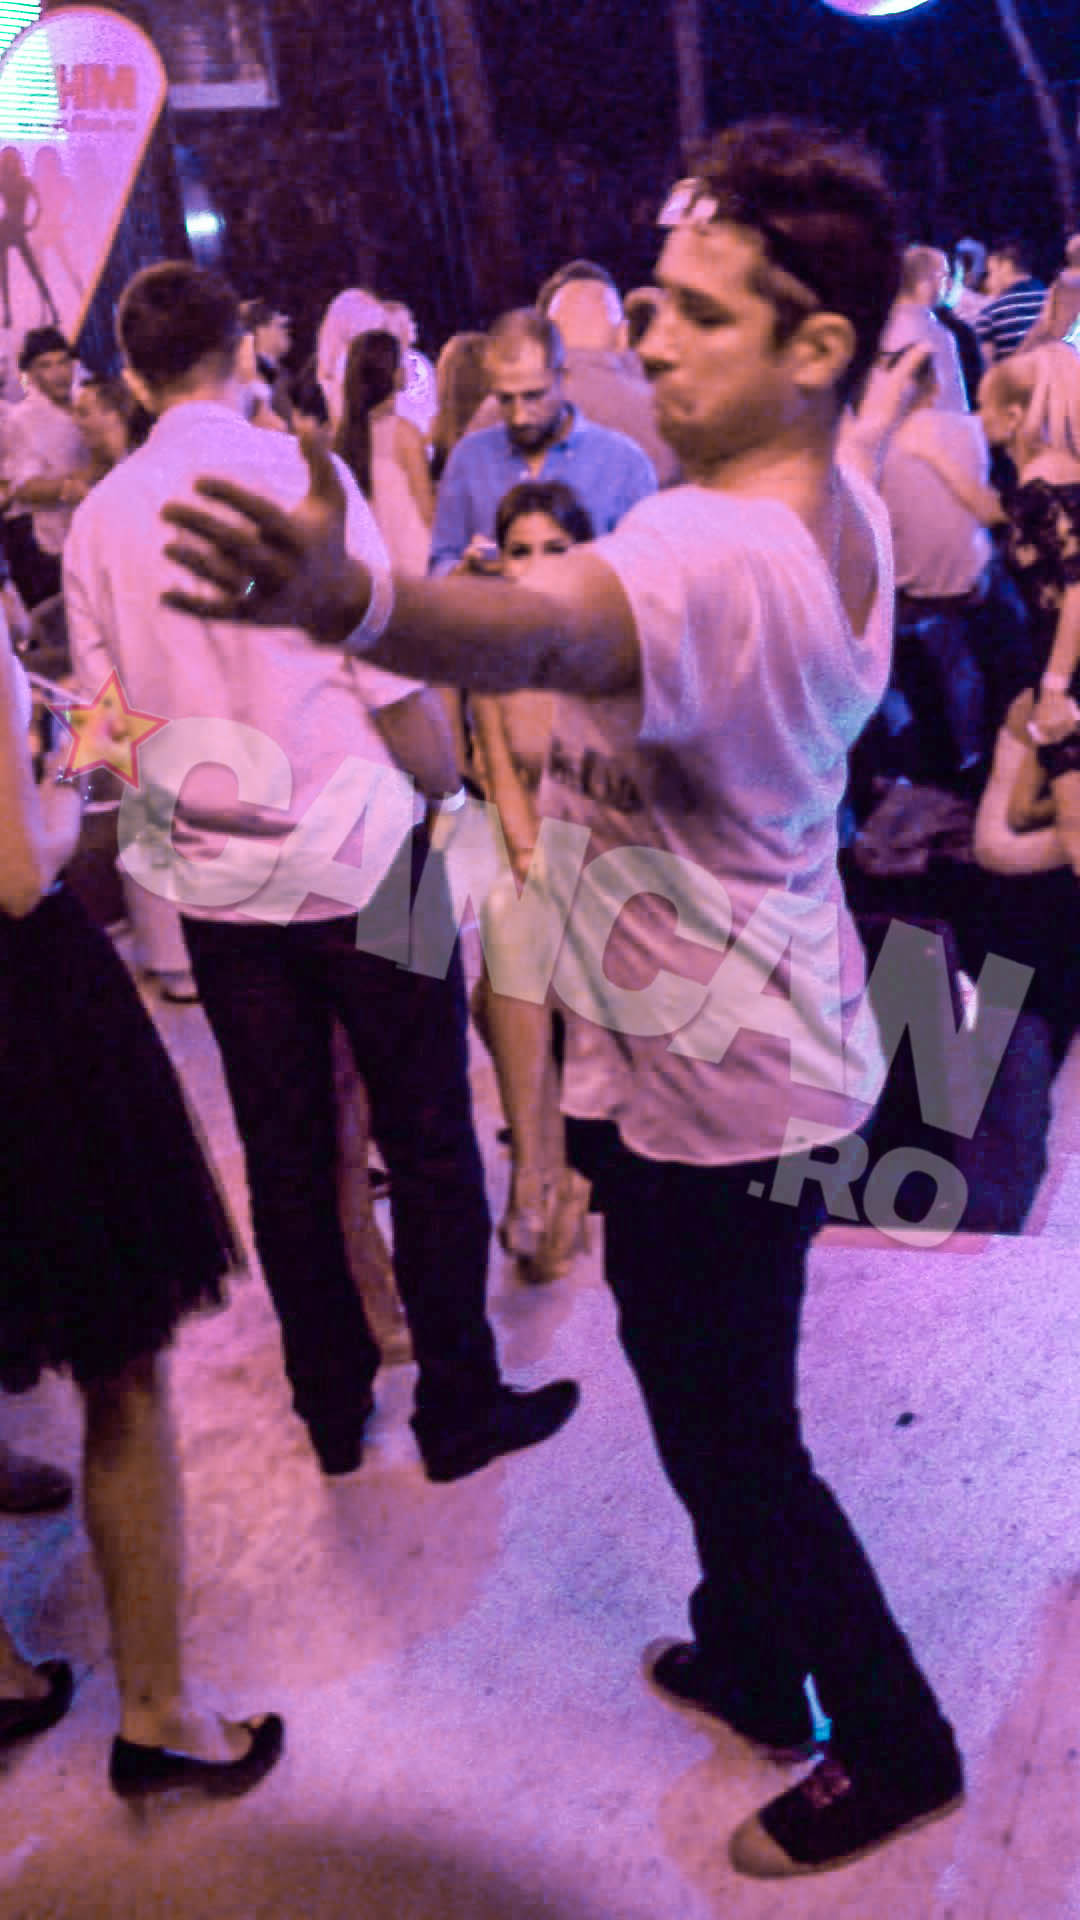 Ramas si el in Bucuresti, Doru a de la Deep Central a exagerat putin cu distractia si a dat-o-n dansuri... haotice